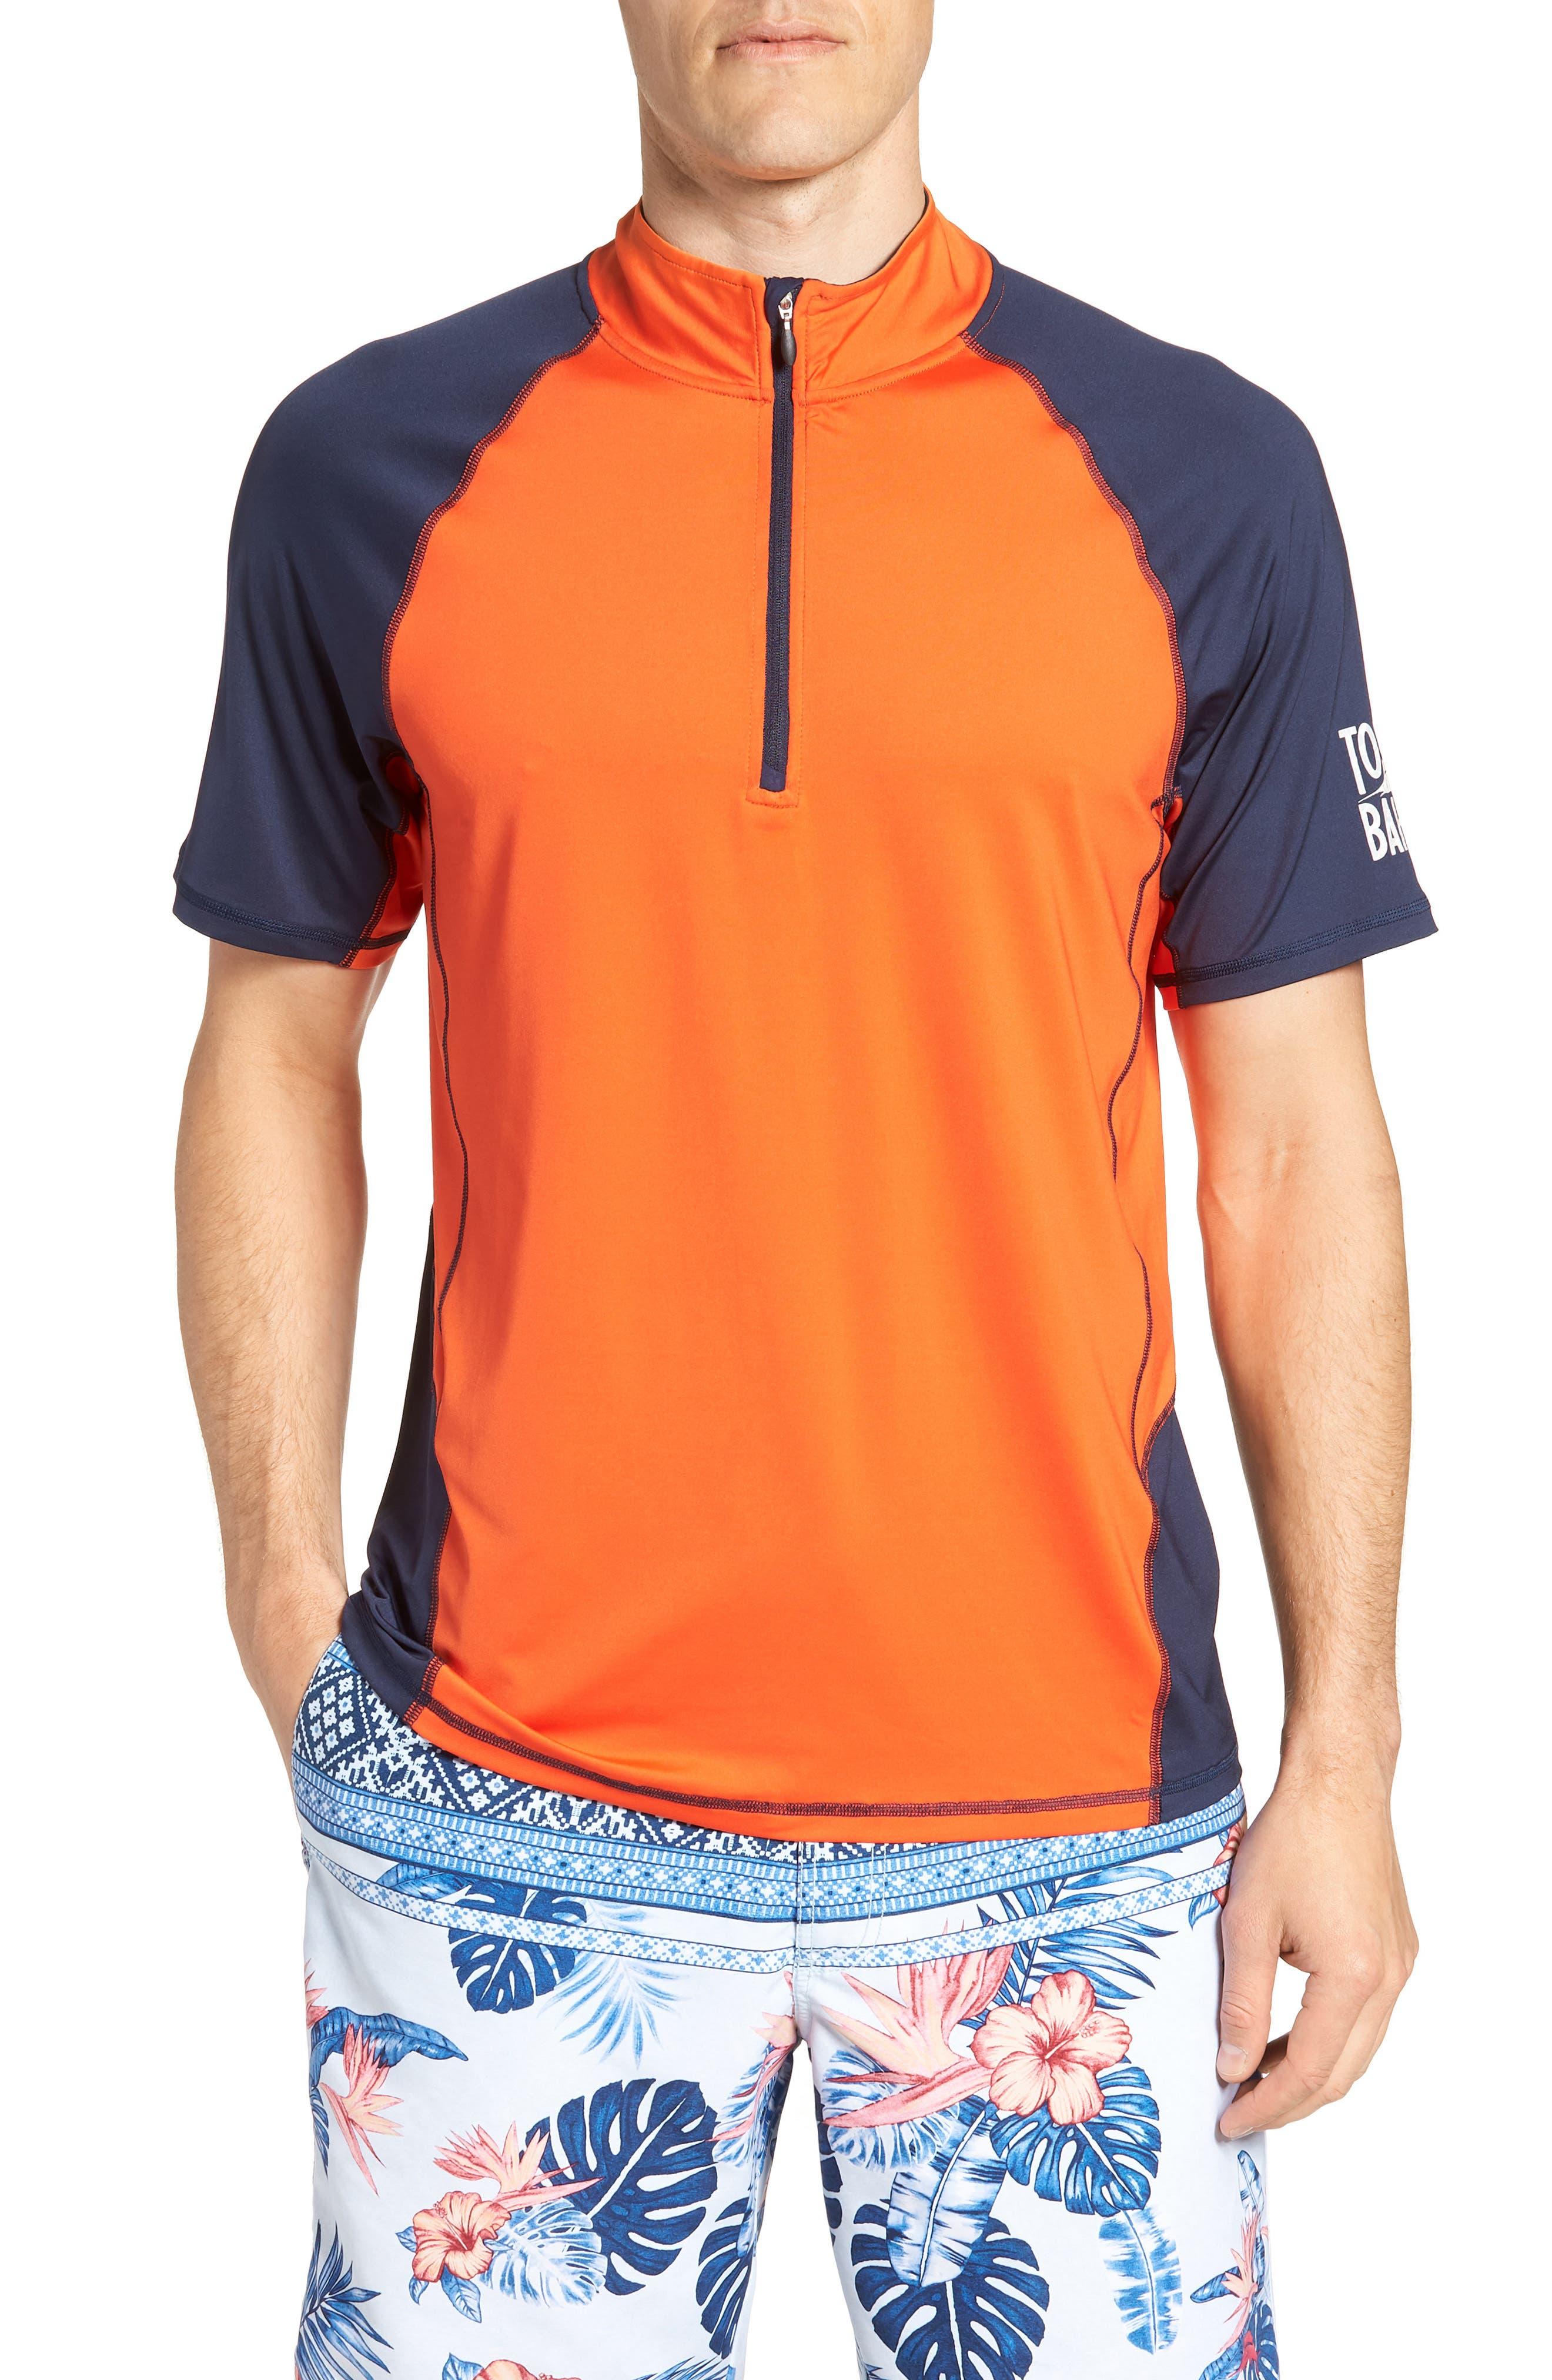 IslandActive<sup>™</sup> Colorblock Beach Pro Rashguard T-Shirt,                             Main thumbnail 1, color,                             Fire Orange